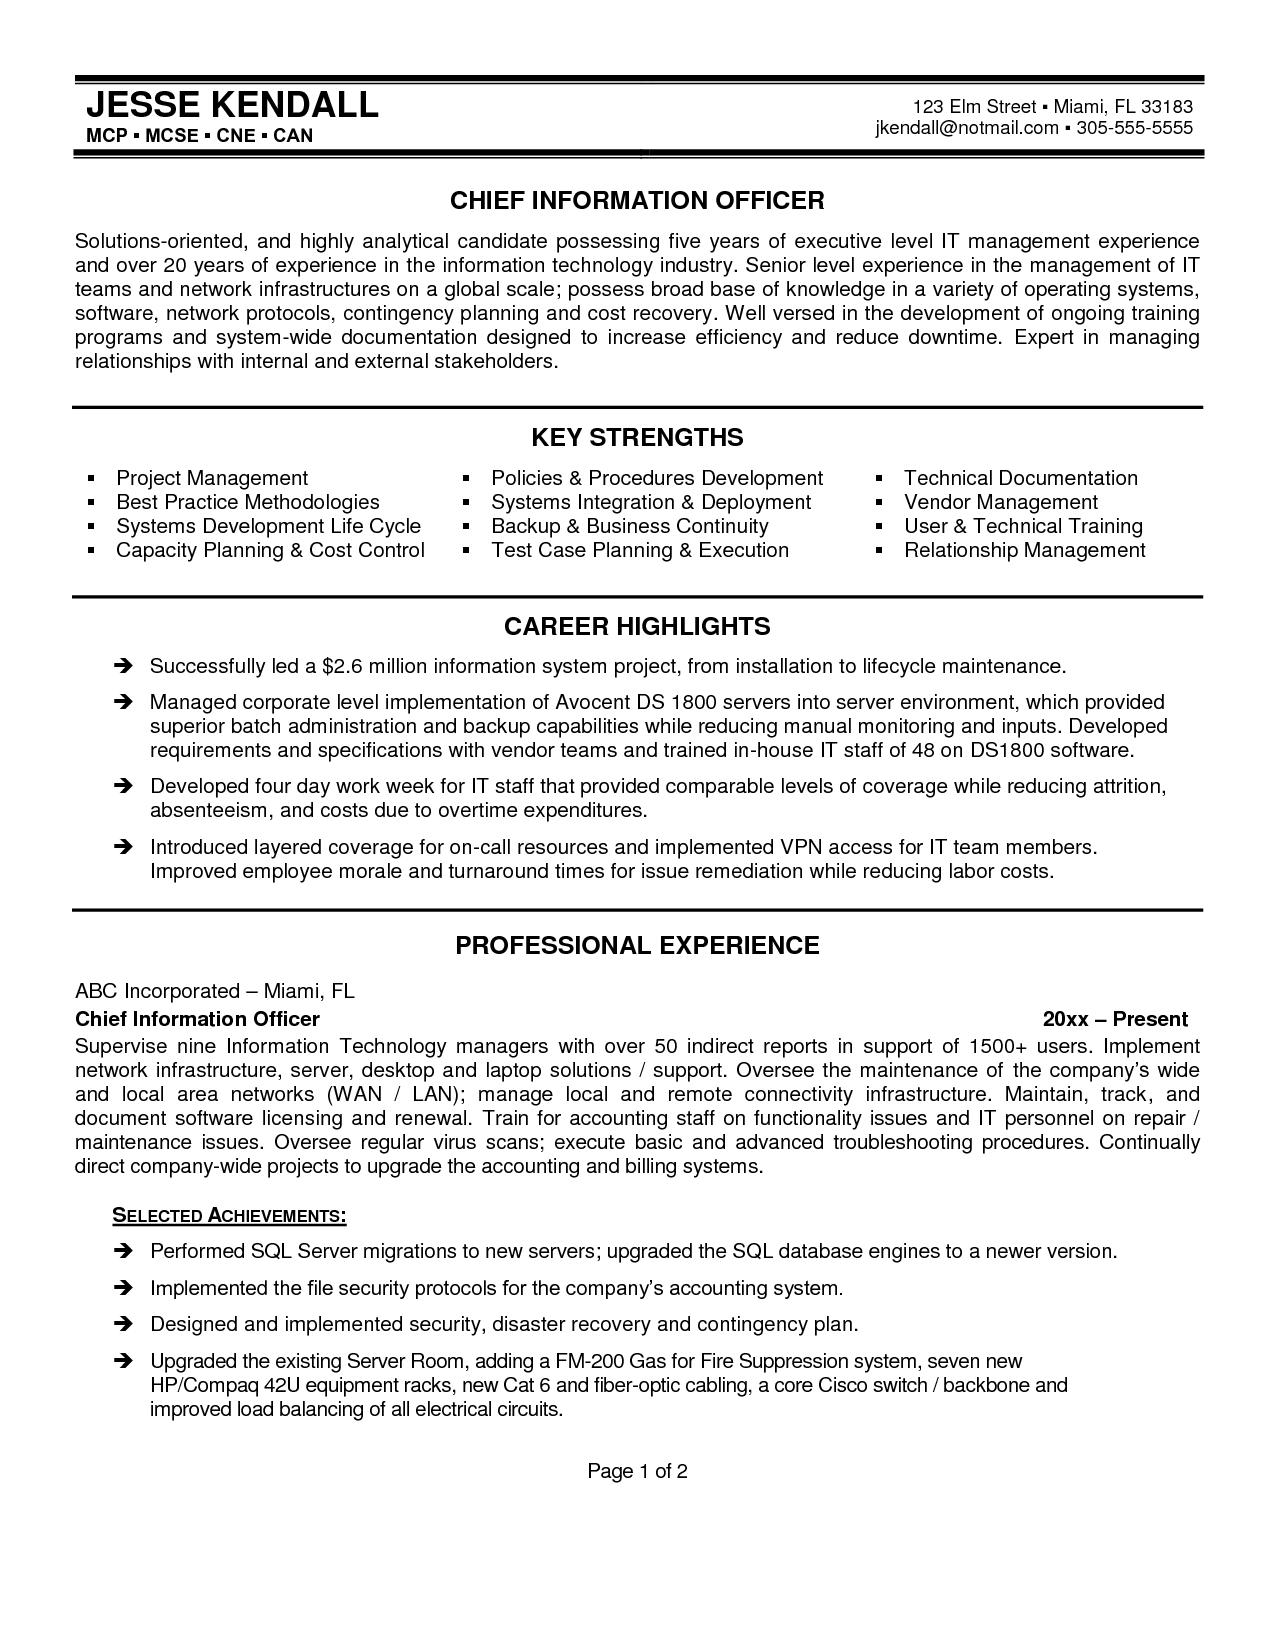 best resume cio resume formats